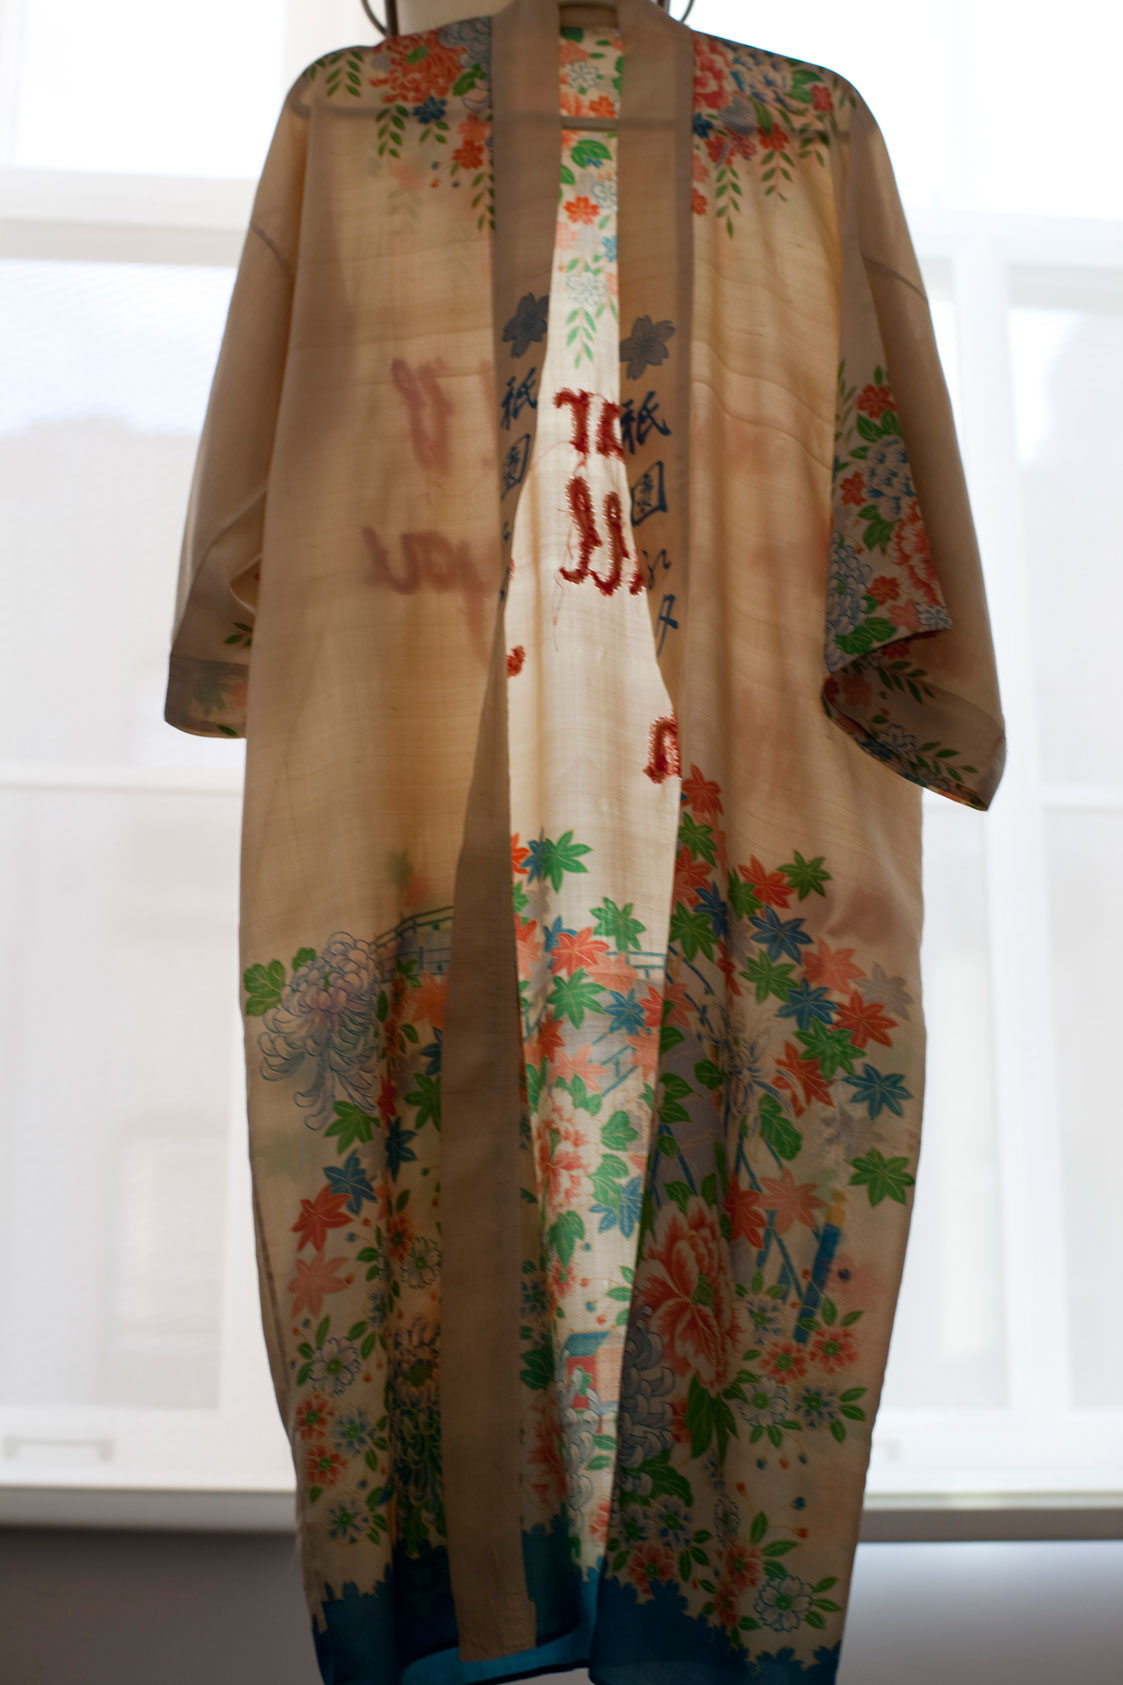 Japanese vintage robe embroidered as feminist art.